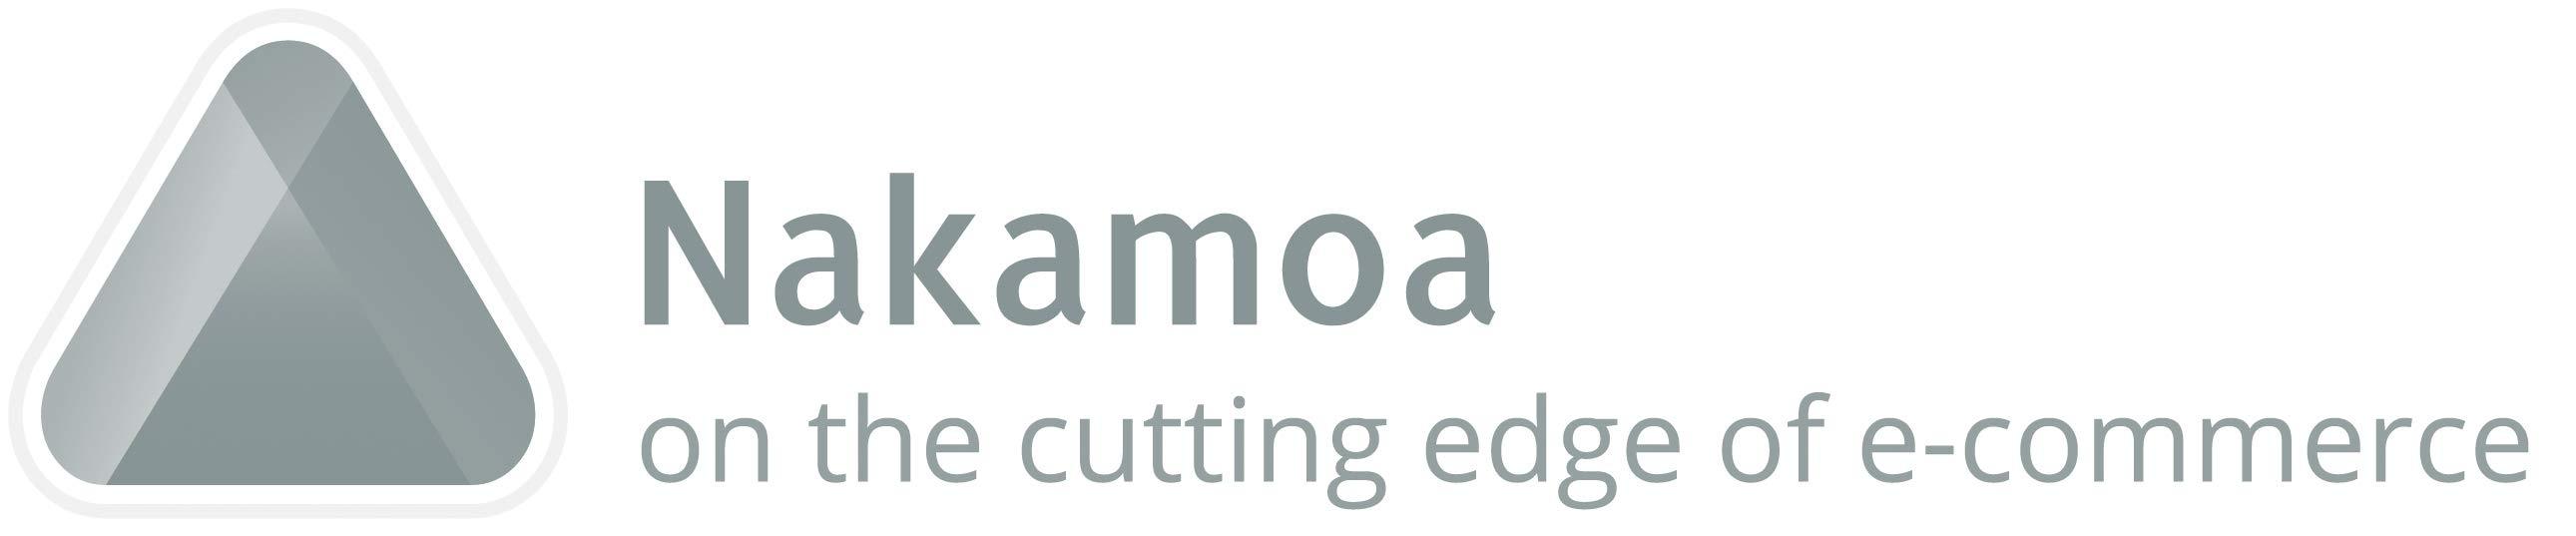 Nakamoa logo